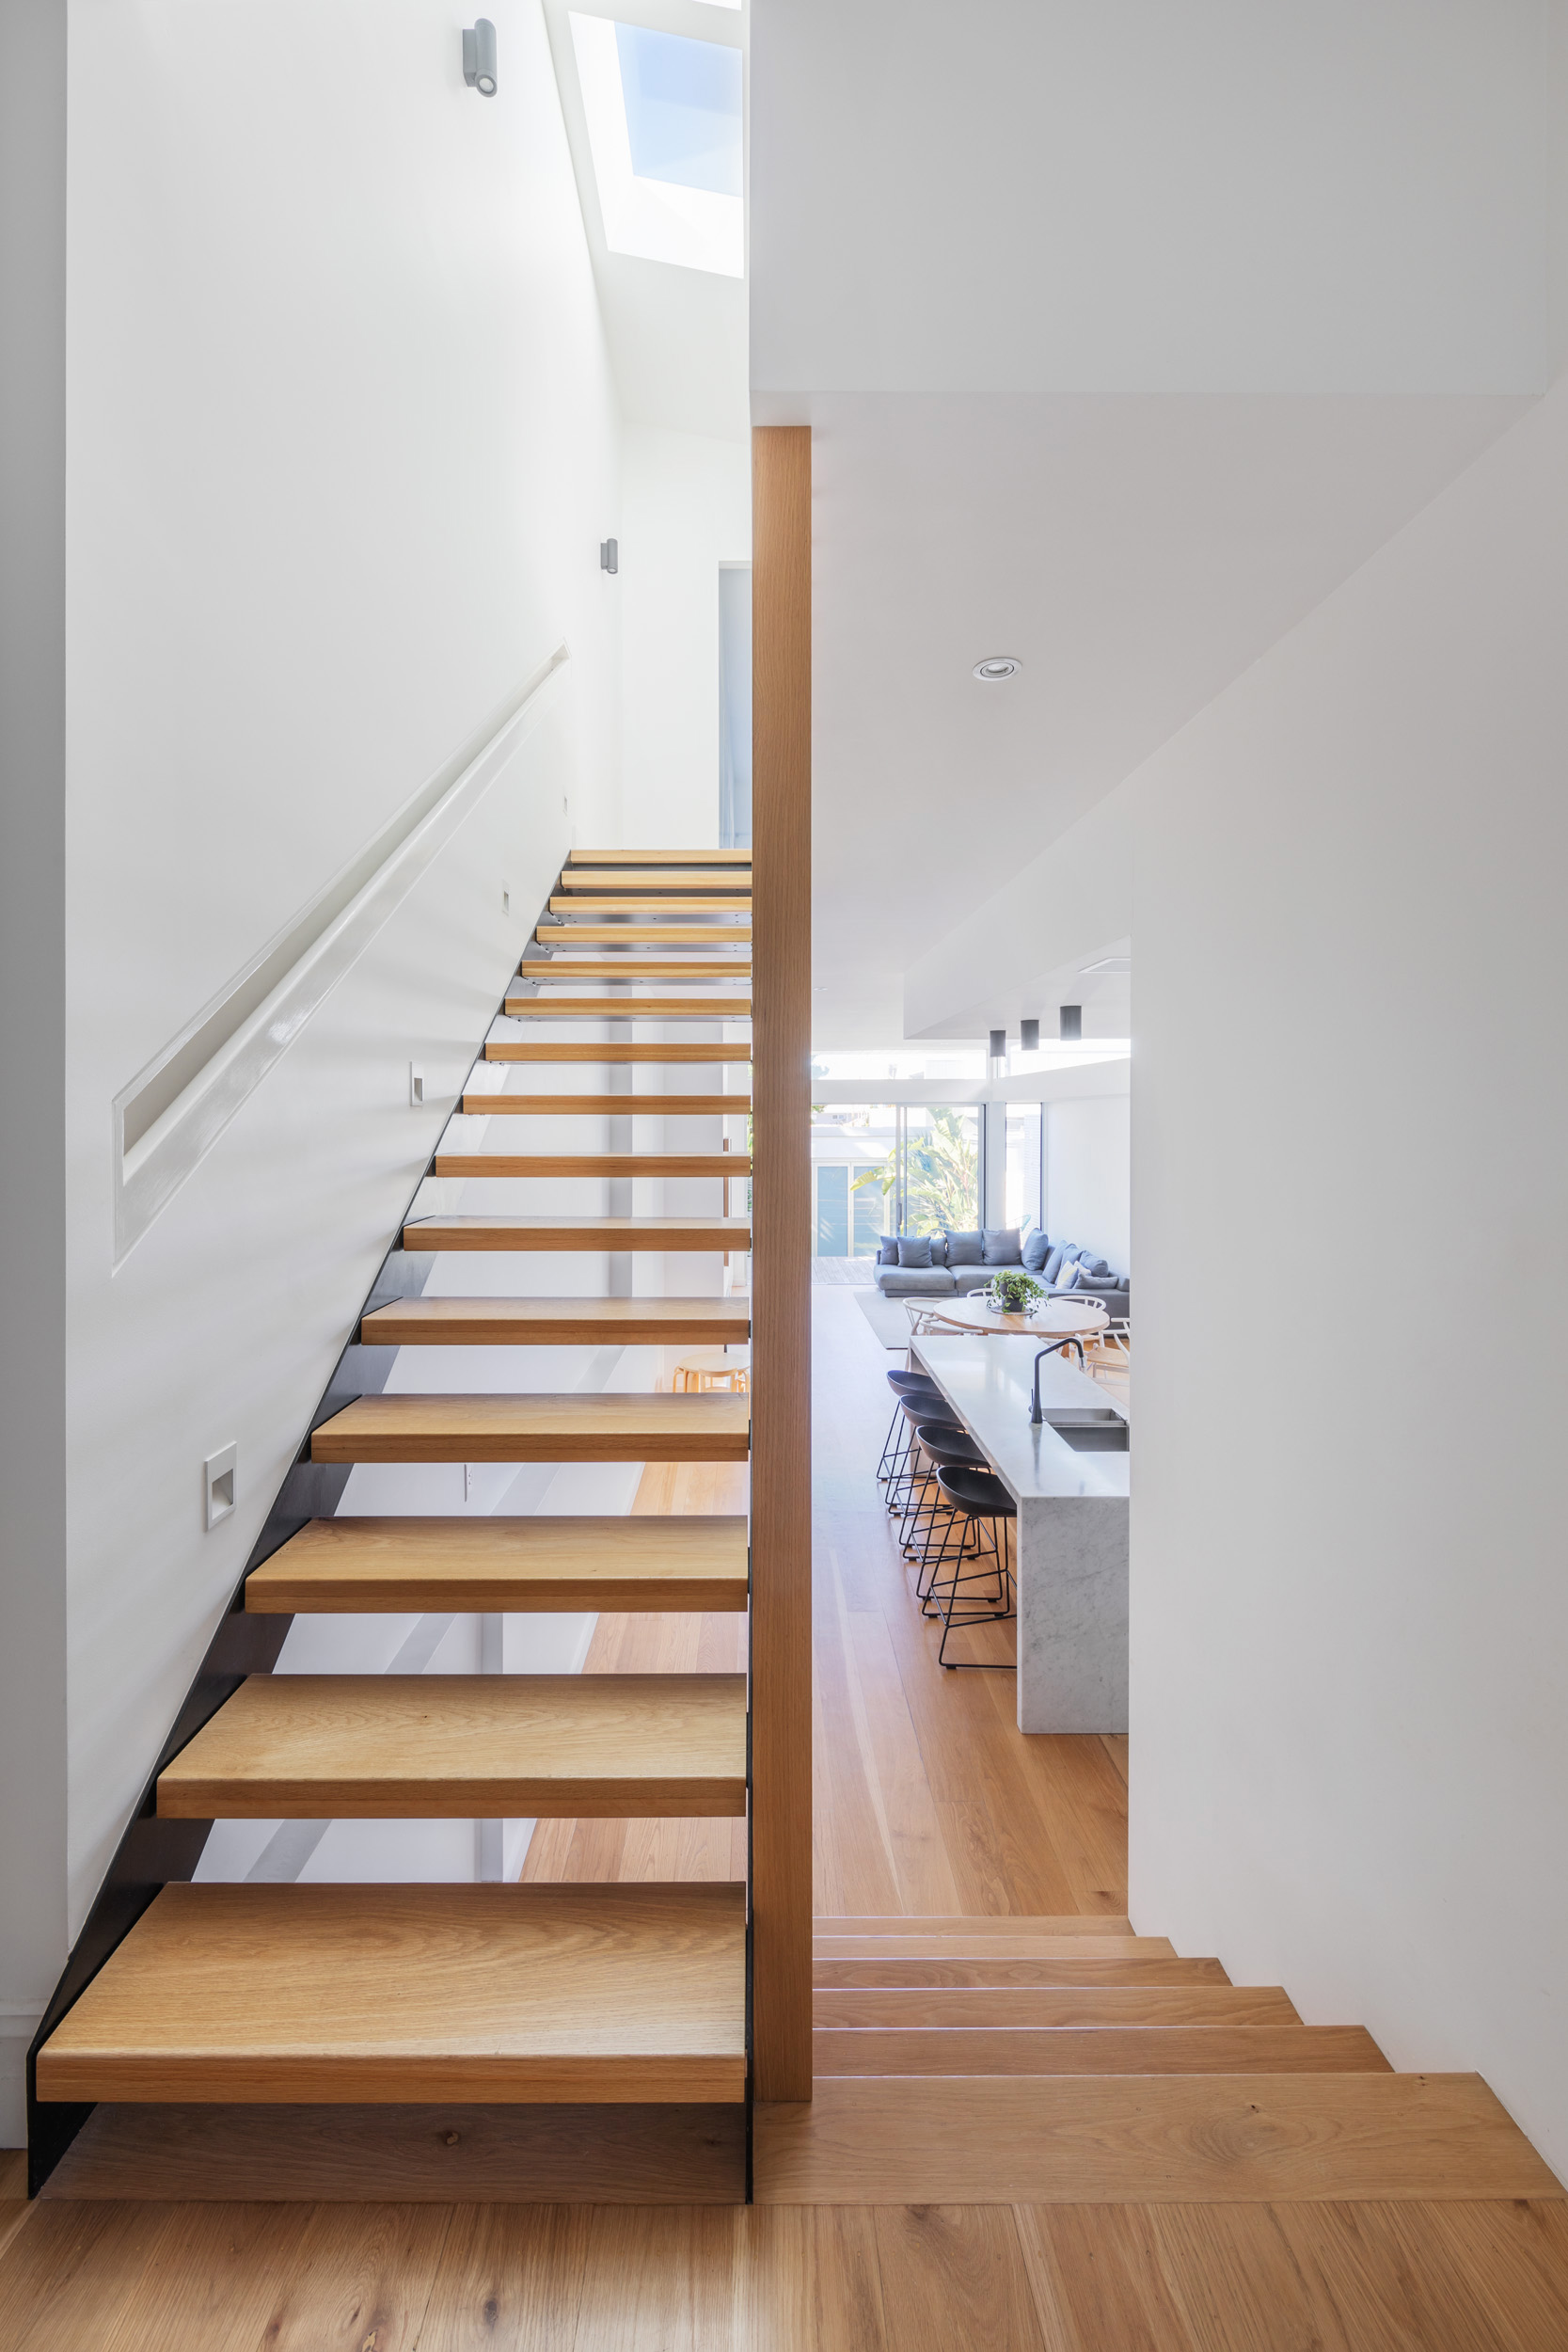 Jem_Cresswell_Architecture_Residential_Photographer_Sydney_Australia_018.jpg